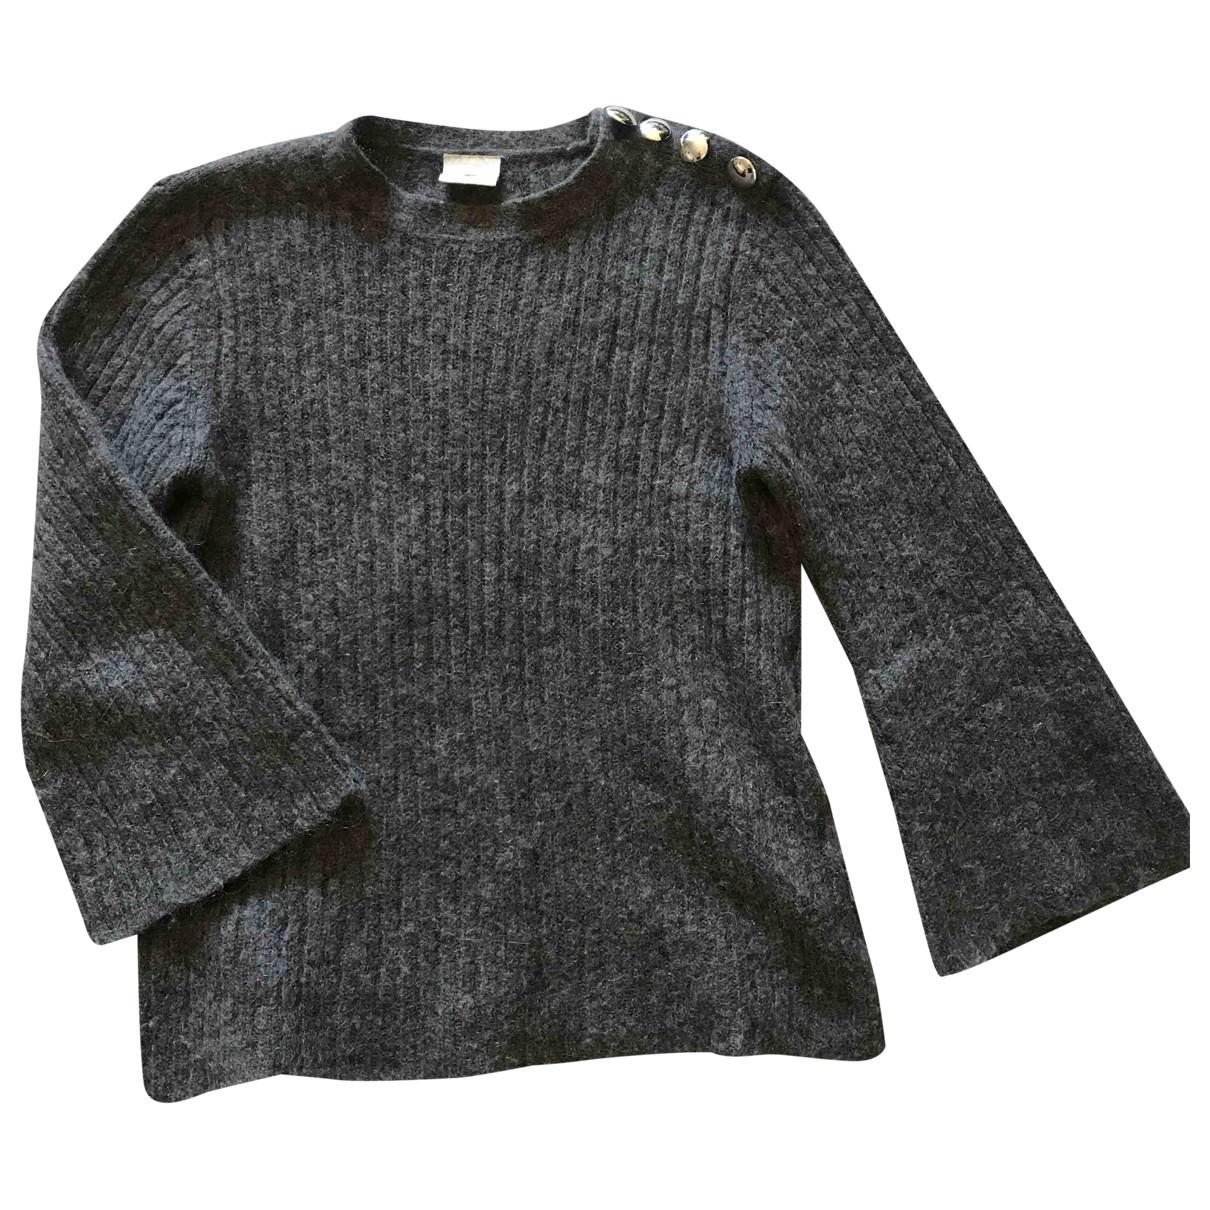 Julie Fagerholt Heartmade - Pull   pour femme en laine - anthracite